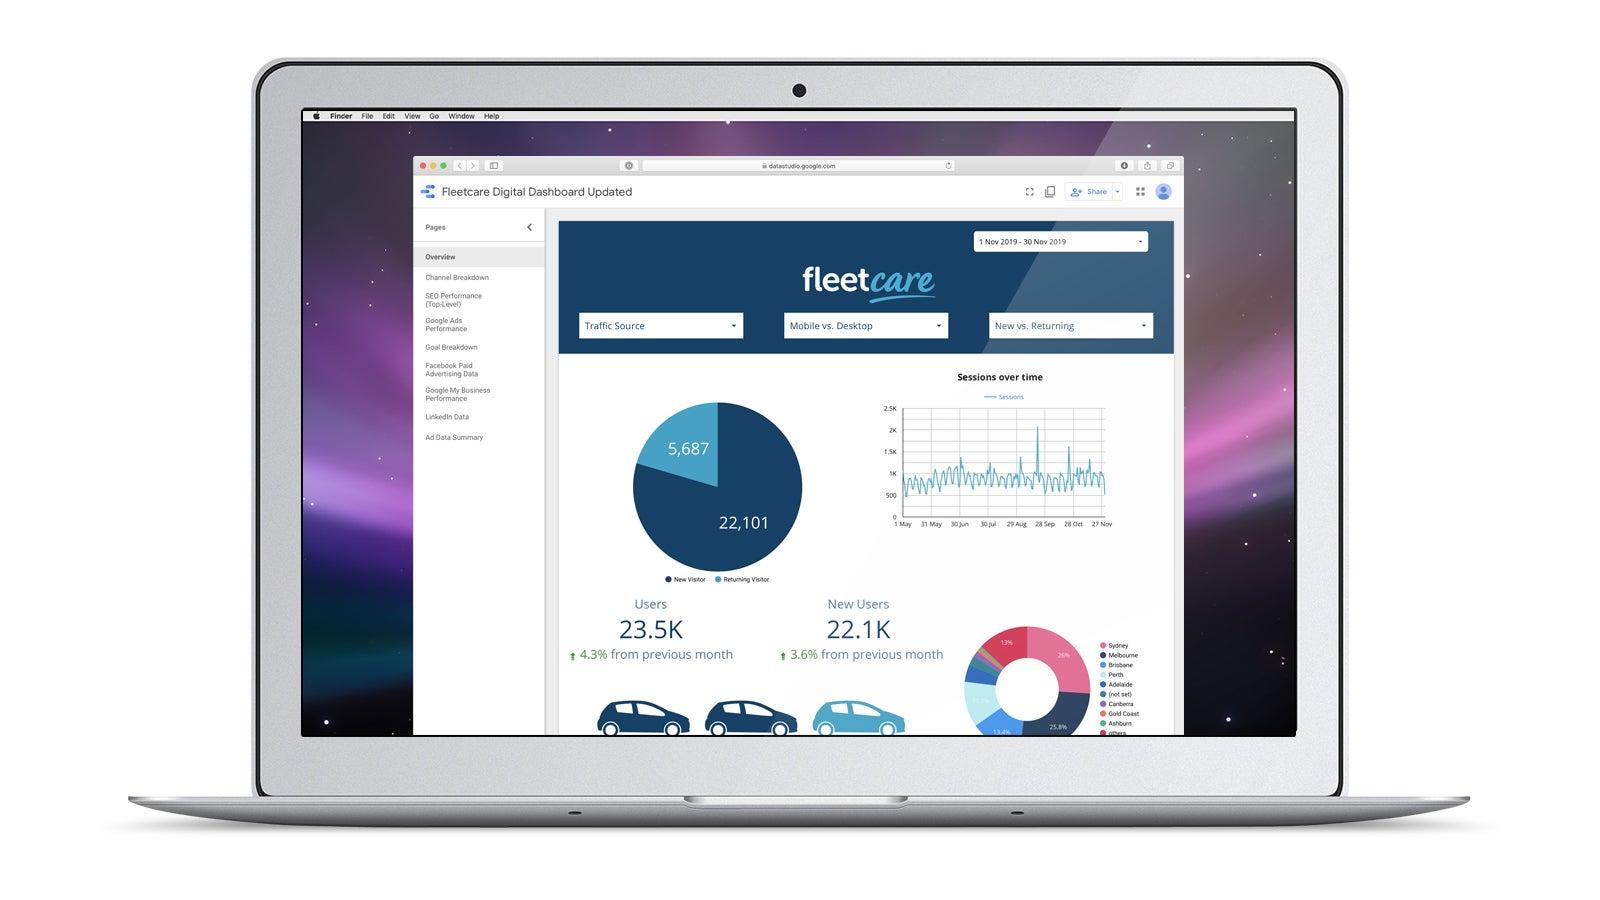 Fleetcare | Fleetcare digital marketing analytics dashboard on laptop | Devotion